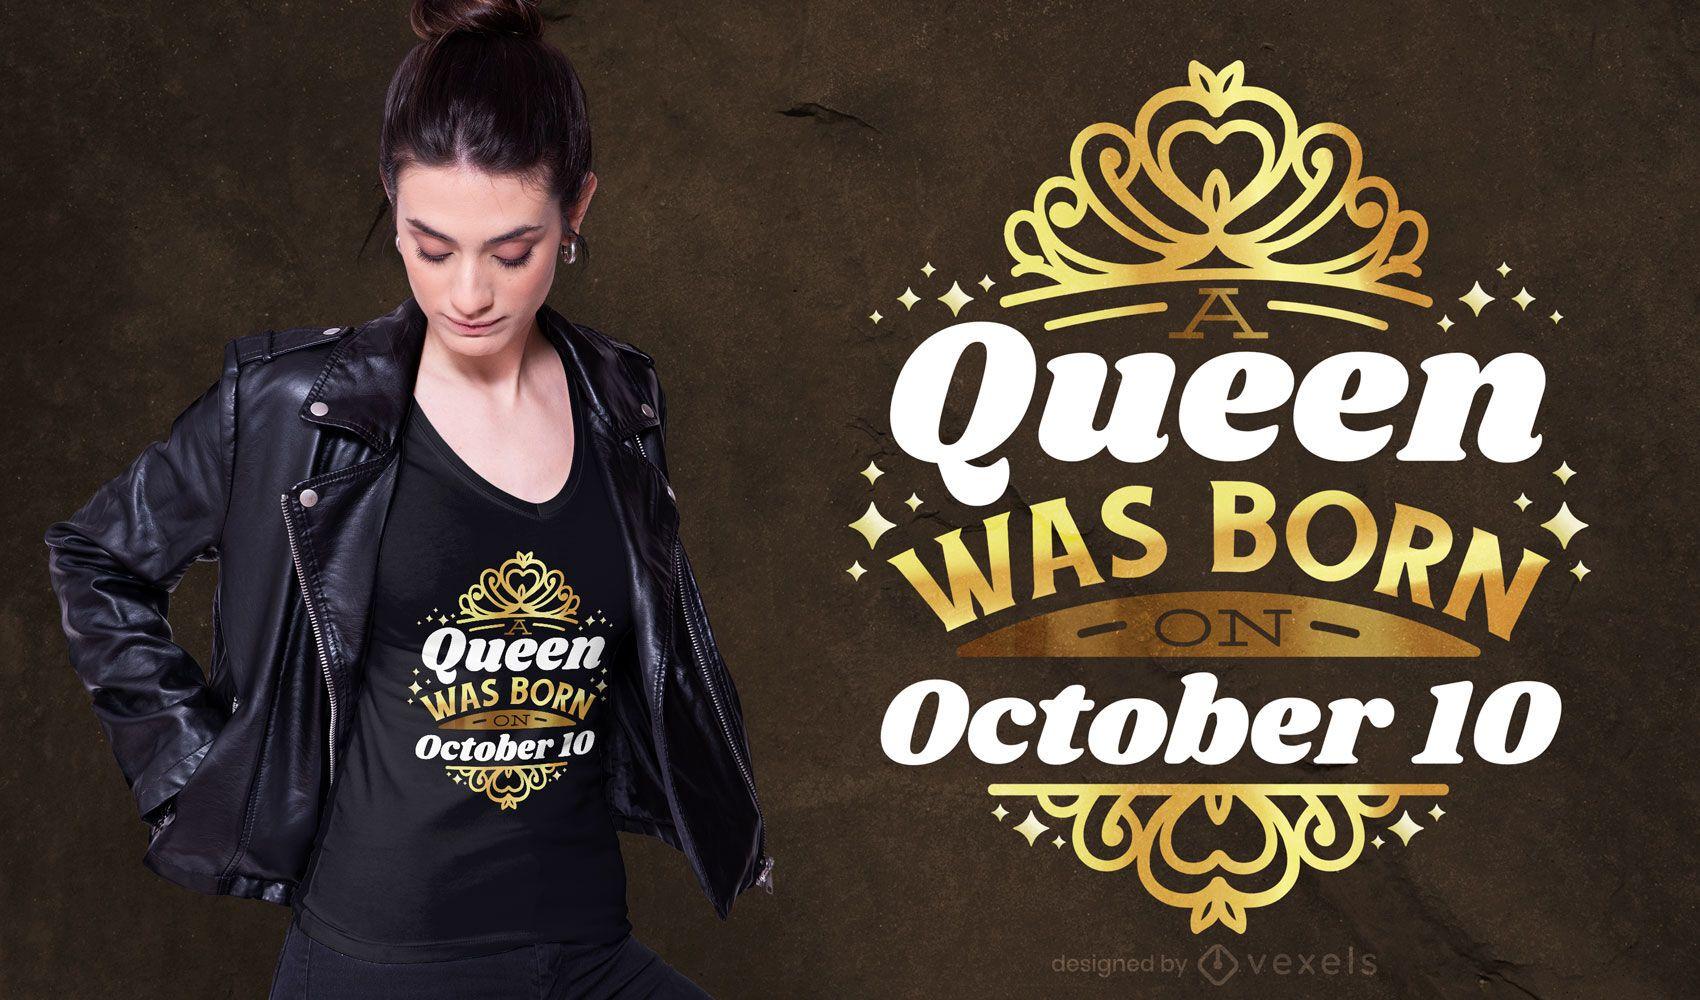 October 10 t-shirt design